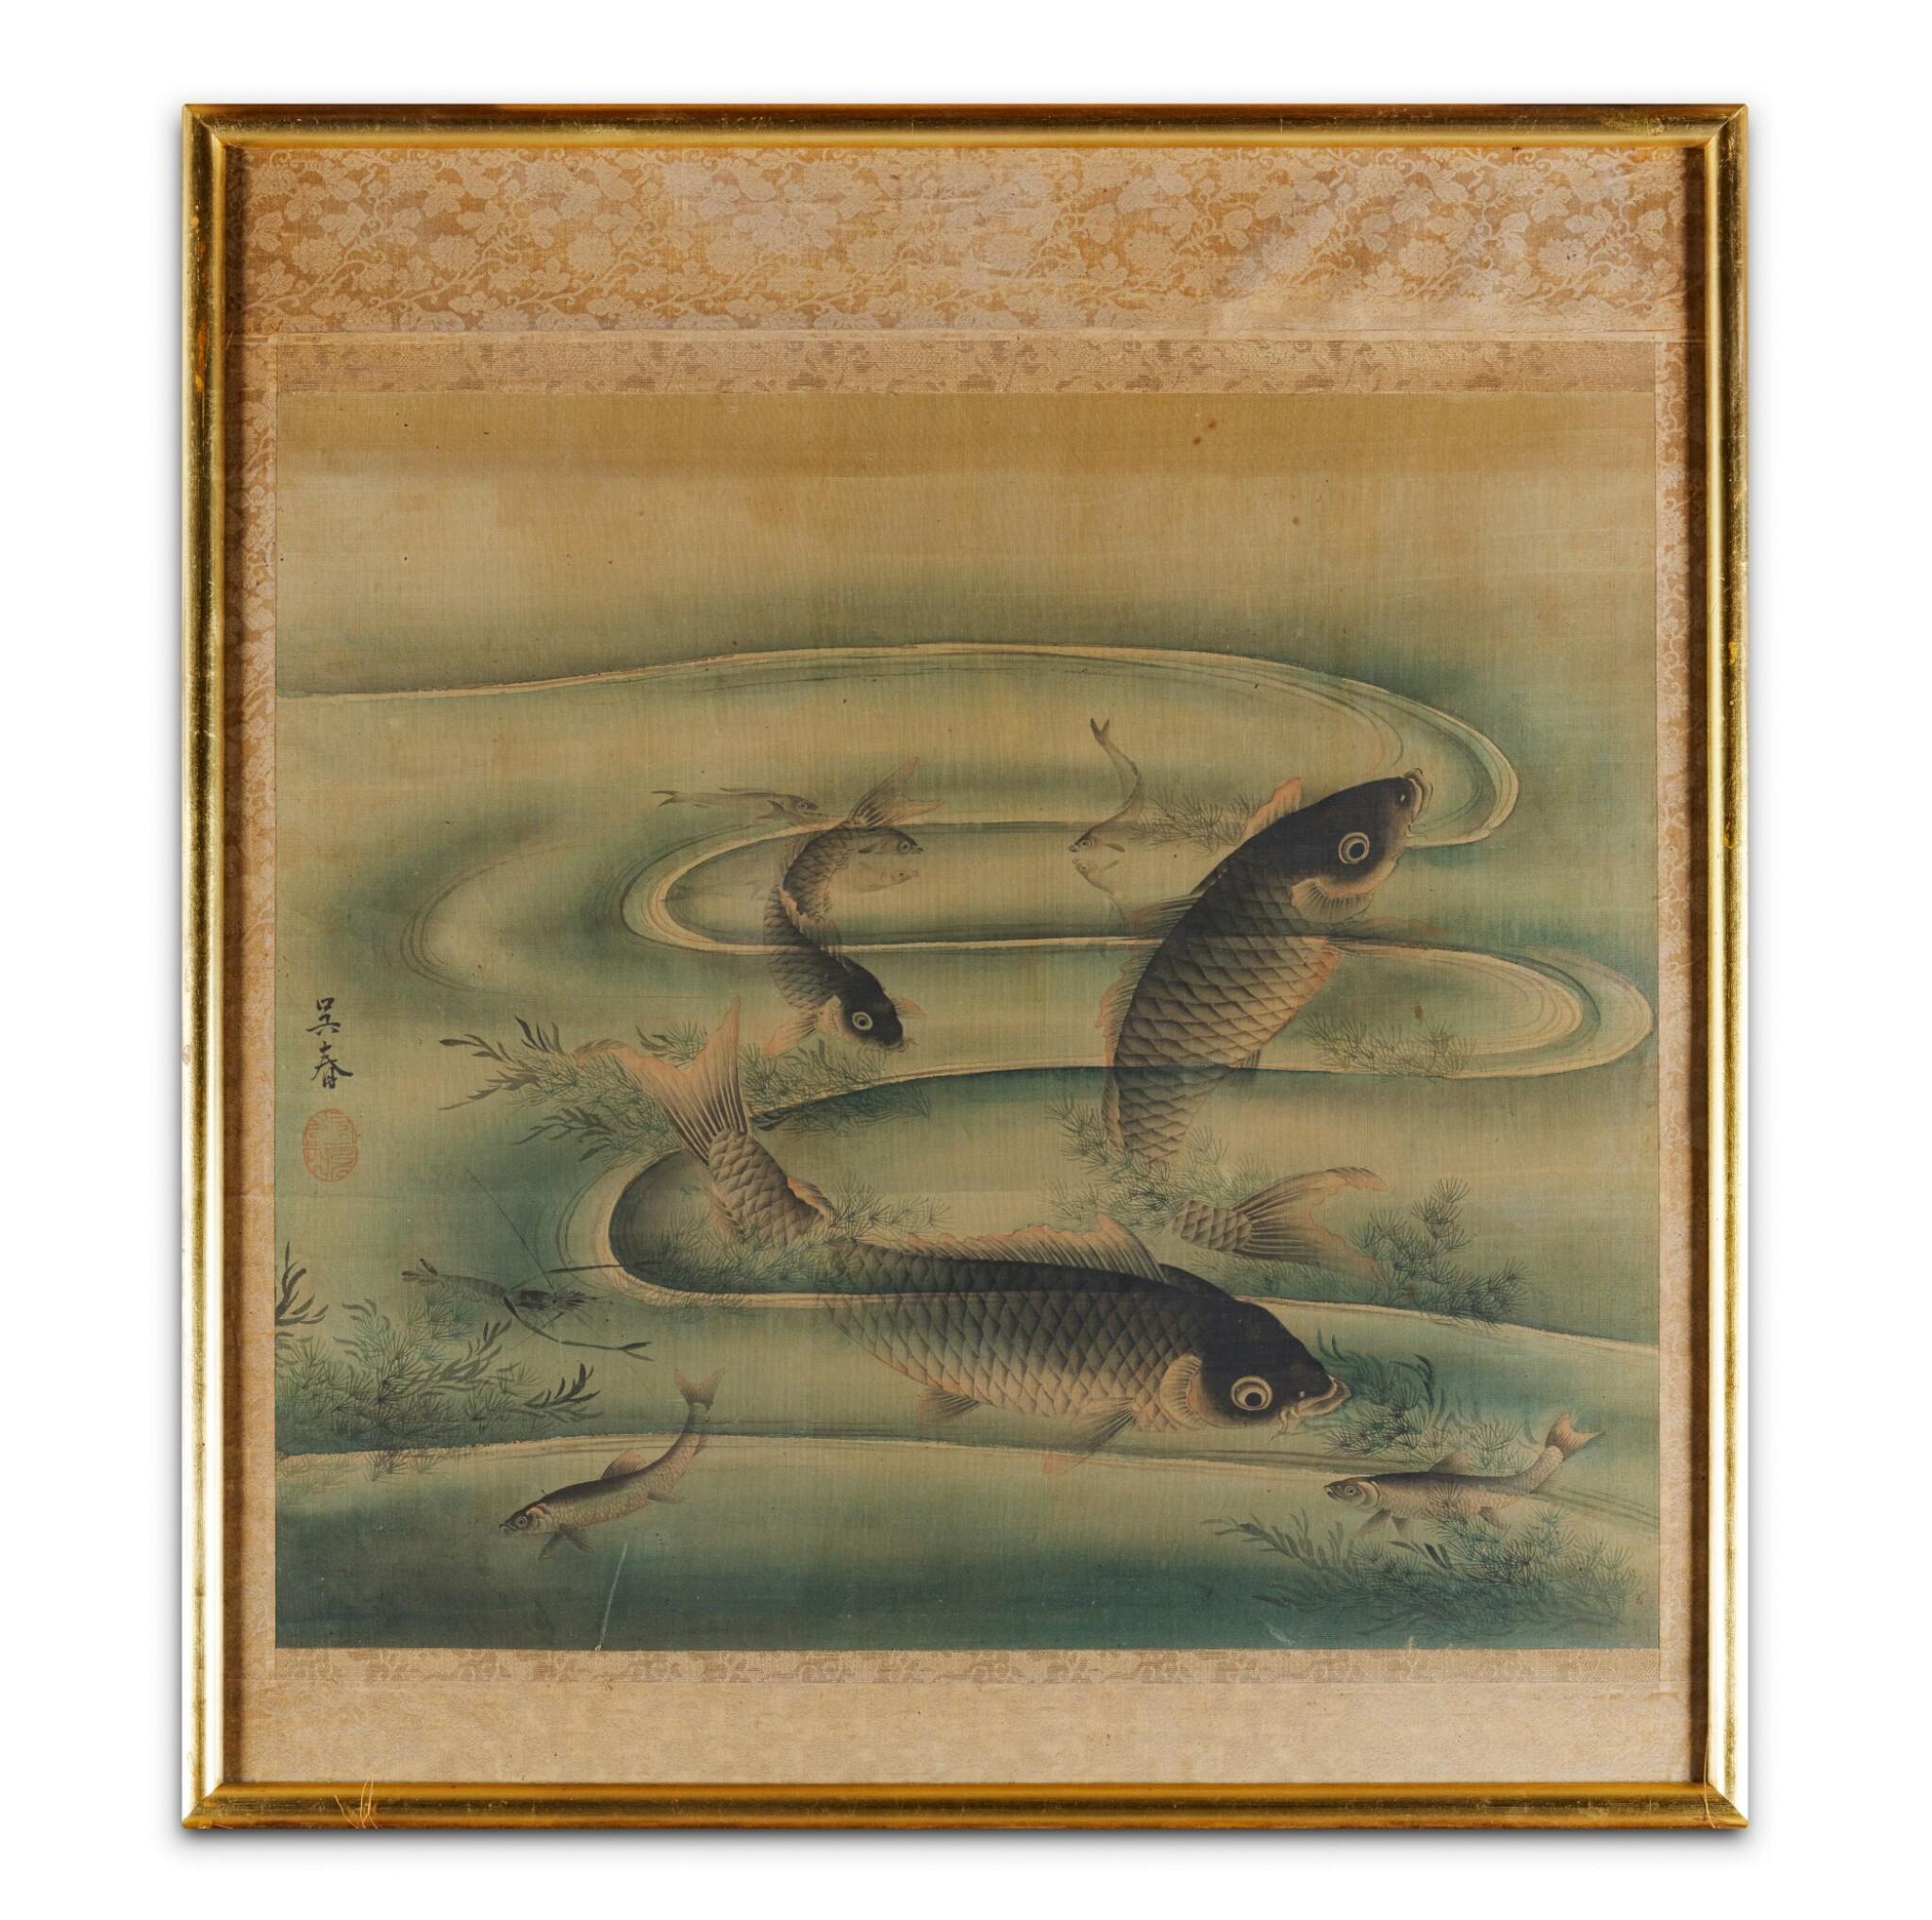 View full screen - View 1 of Lot 264. Avec la signature de Matsumura Goshun Les carpes | 松村吳春(款) 鯉魚圖 | With the signature of Matsumura Goshun.